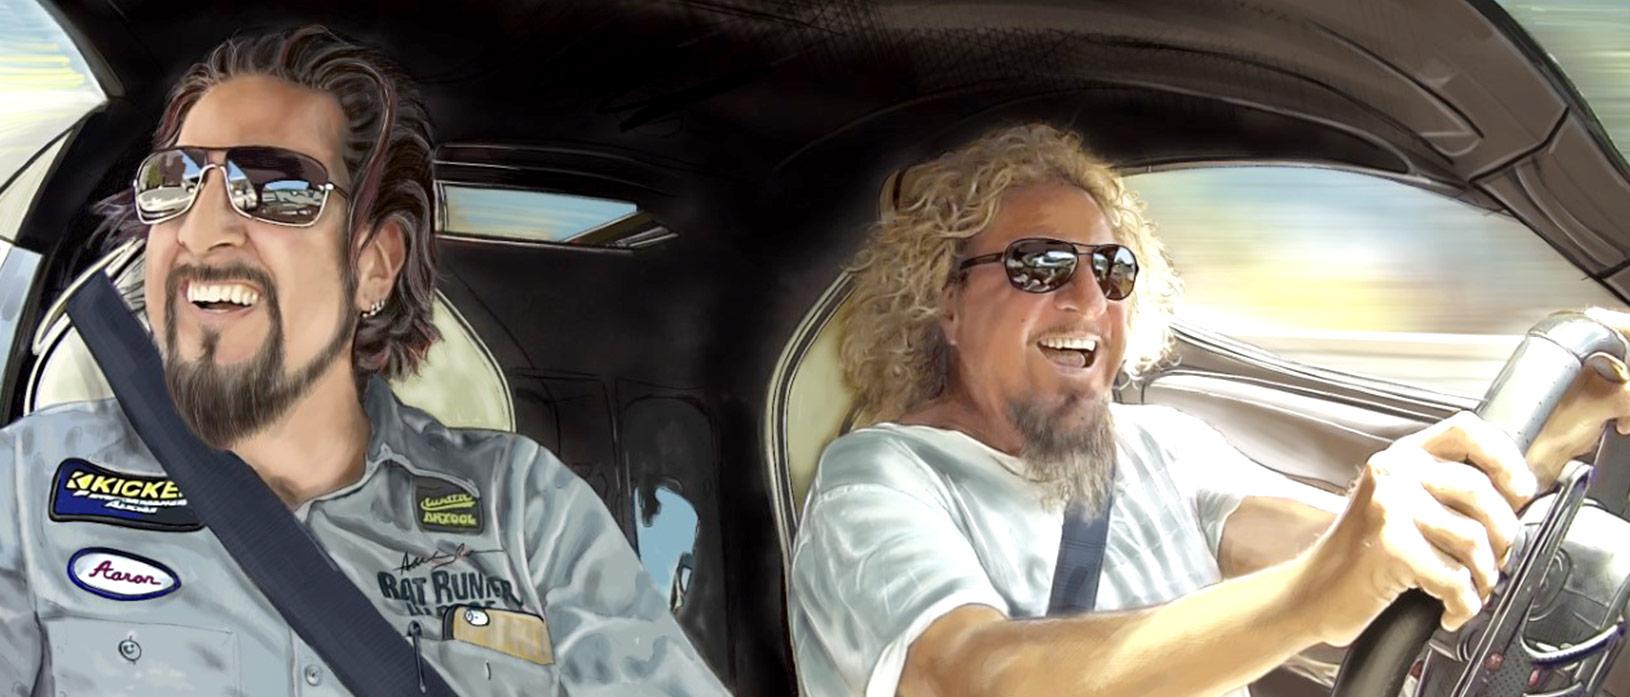 Aaron & Sammy Hagar driving in a car all smiles